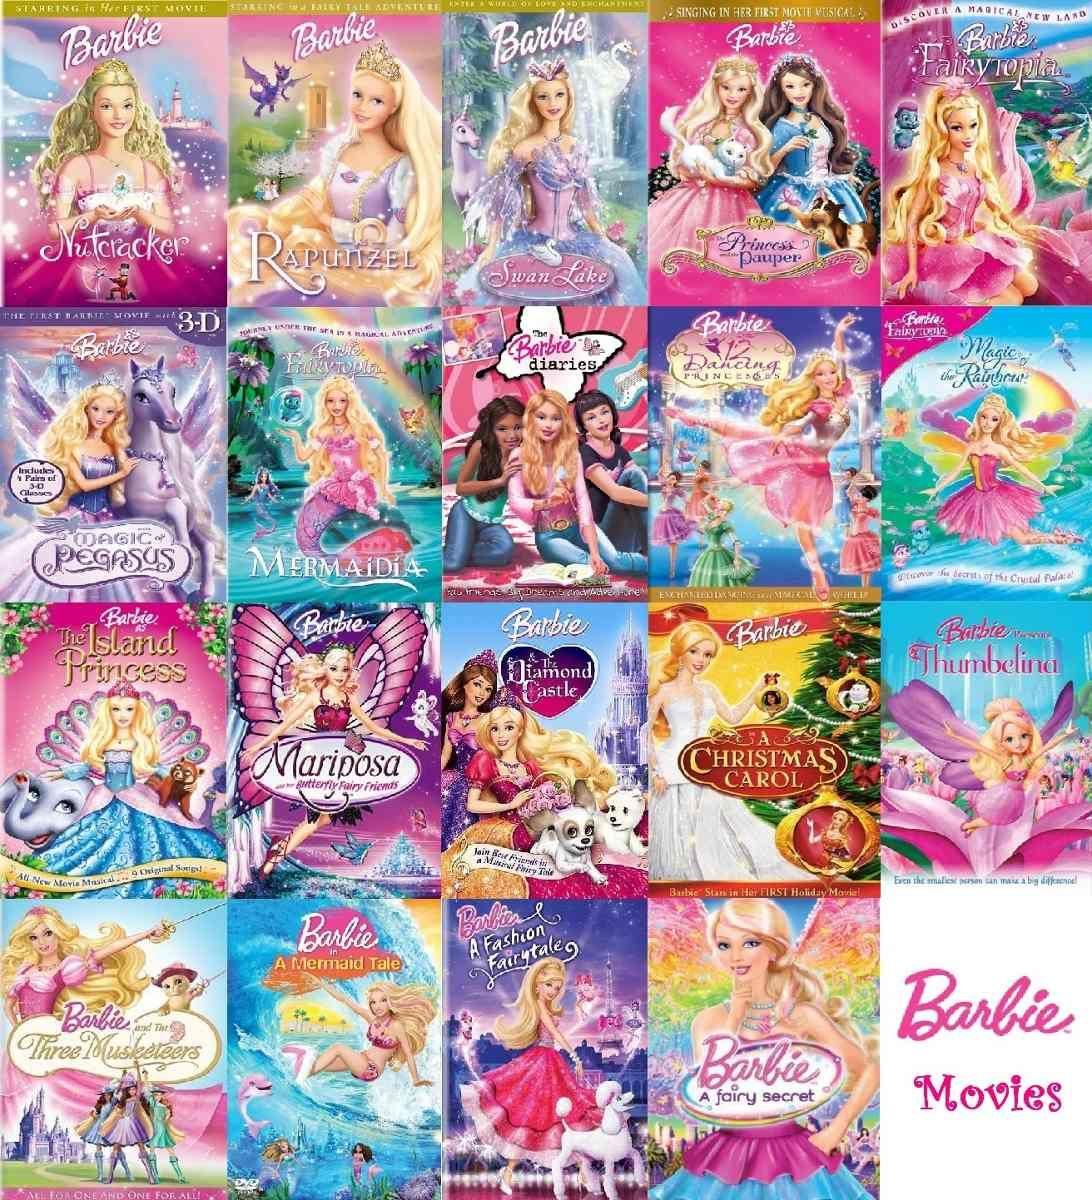 Coleccion Peliculas De Barbie Barbie Movies Barbie Movie Collection